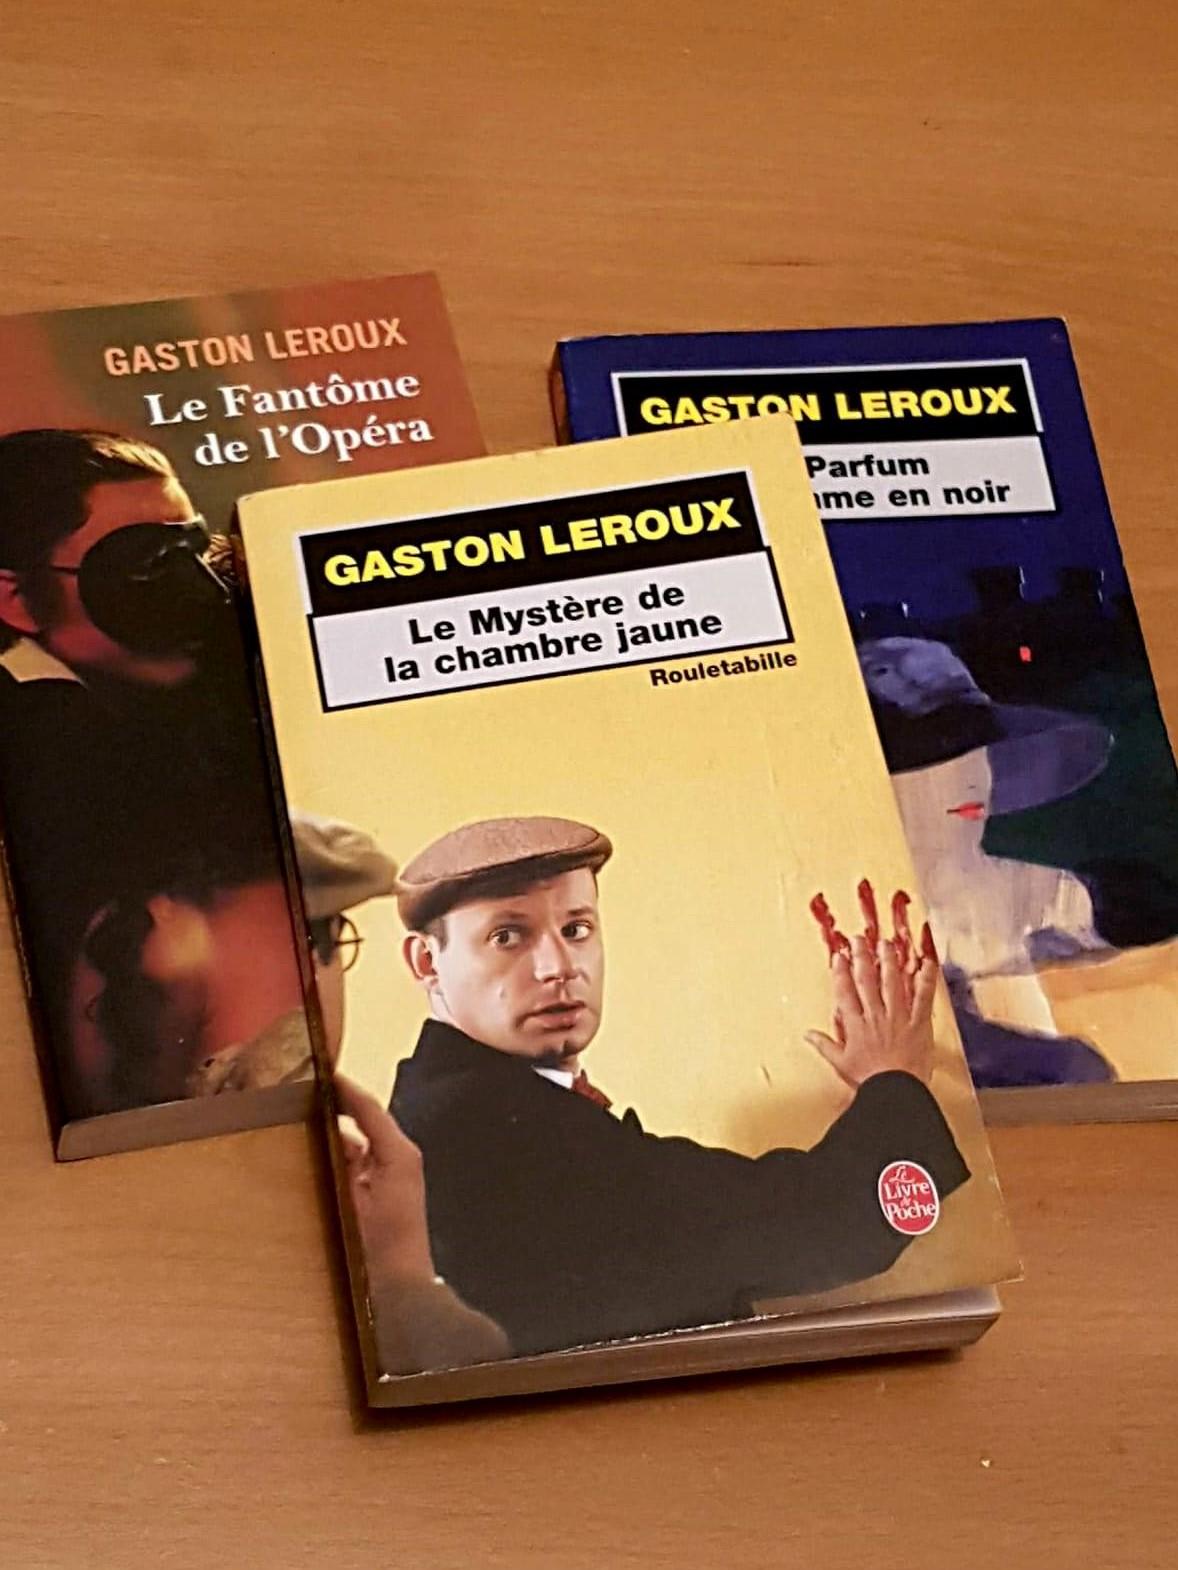 Cat s books rock 39 n 39 roll le myst re de la chambre jaune 1907 - Le mistere de la chambre jaune ...